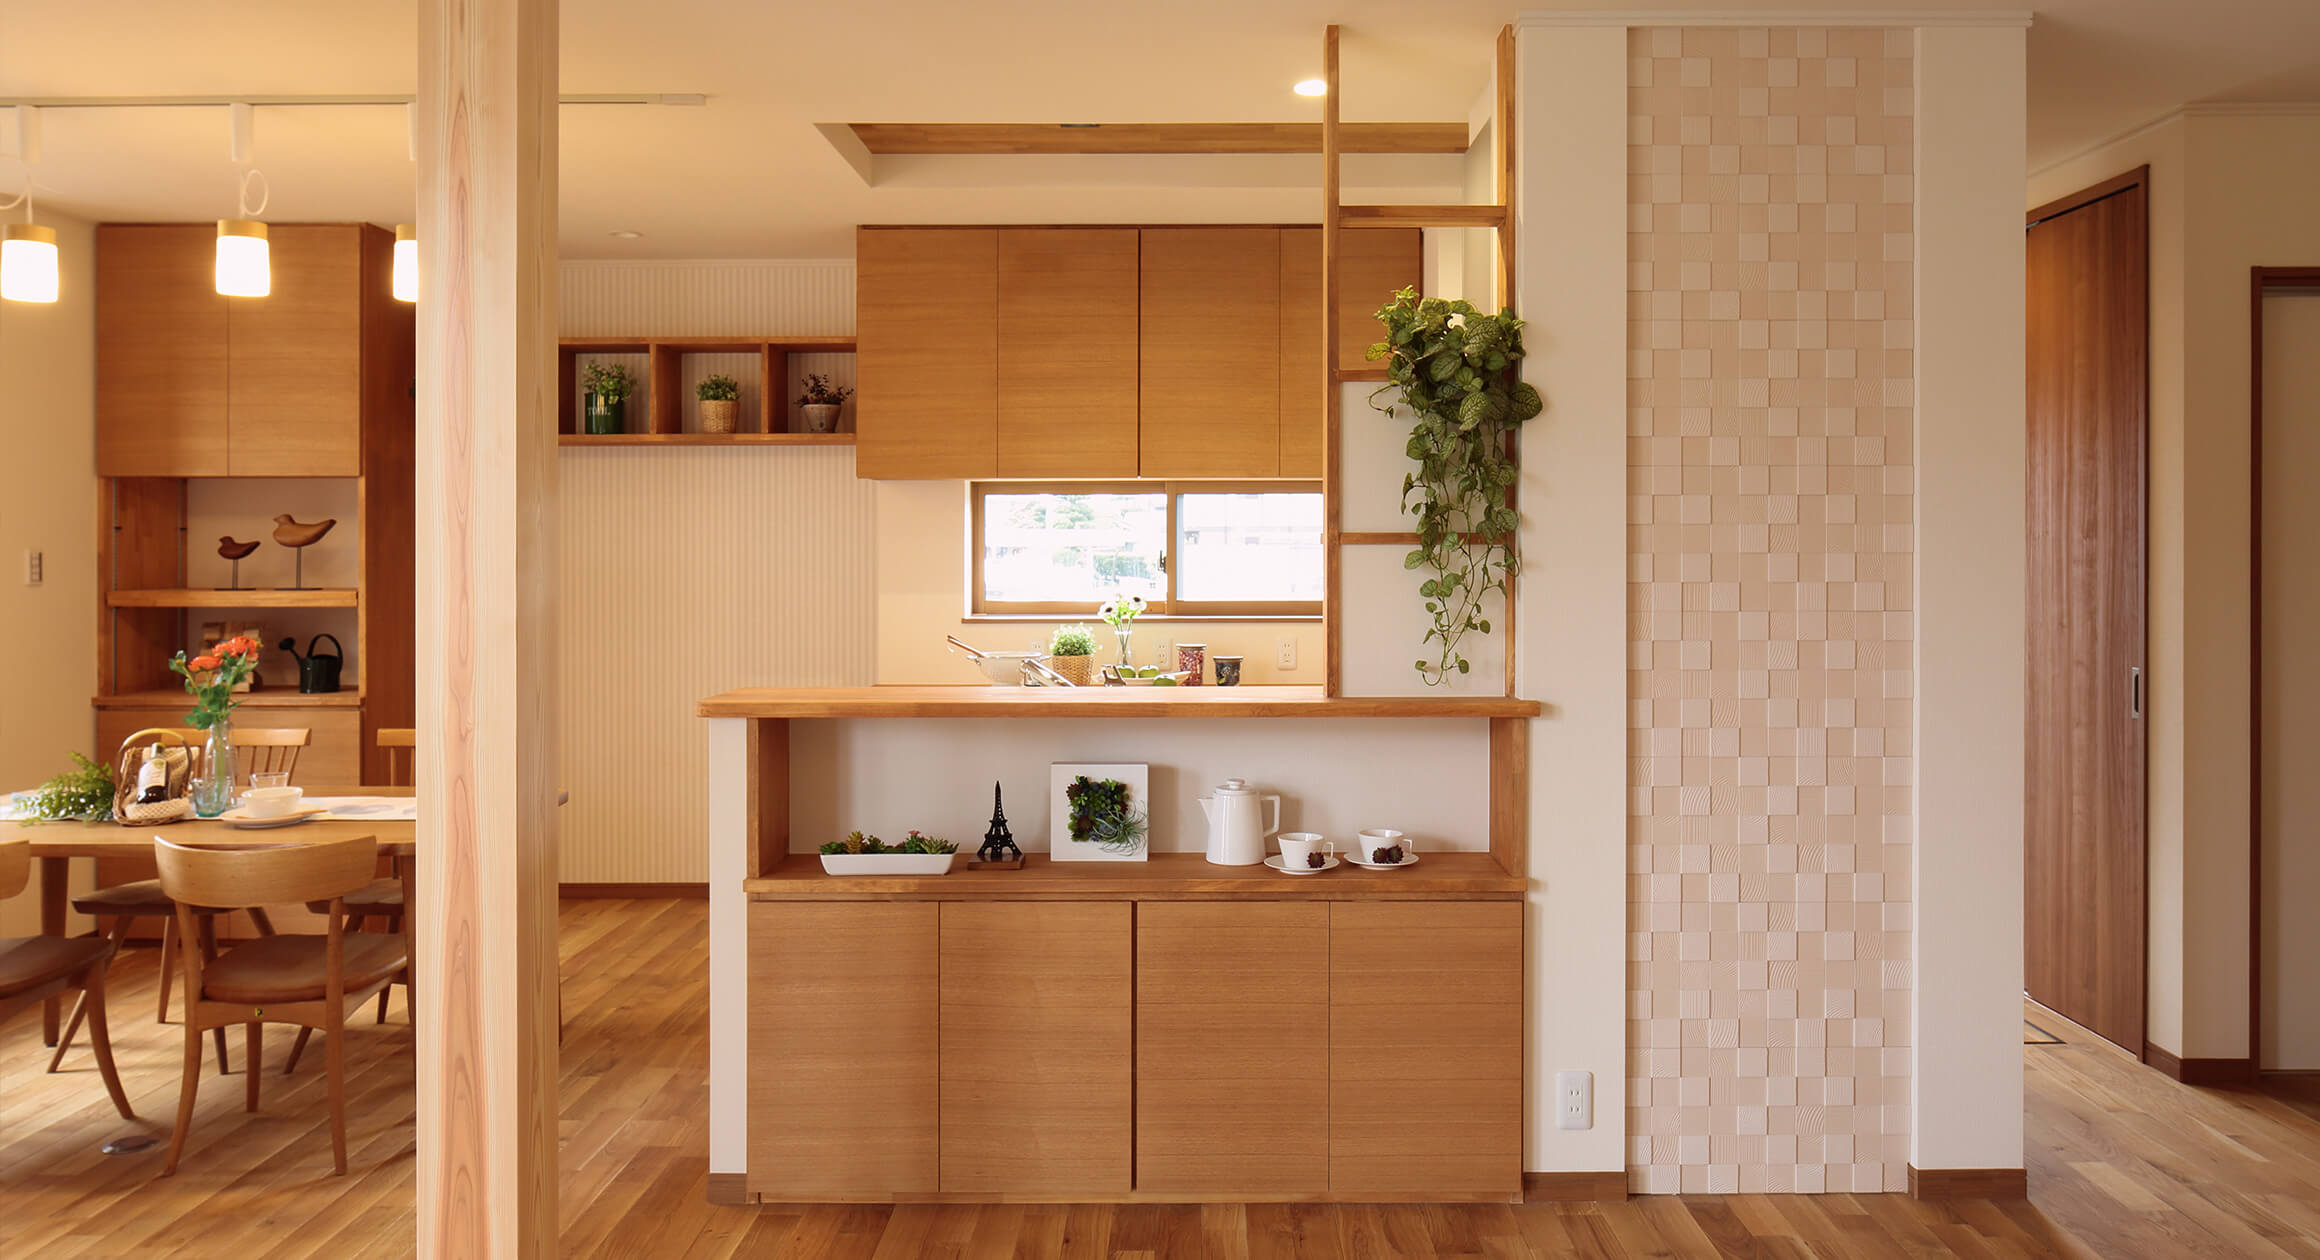 三友工務店の新築注文住宅 熊本市H様邸